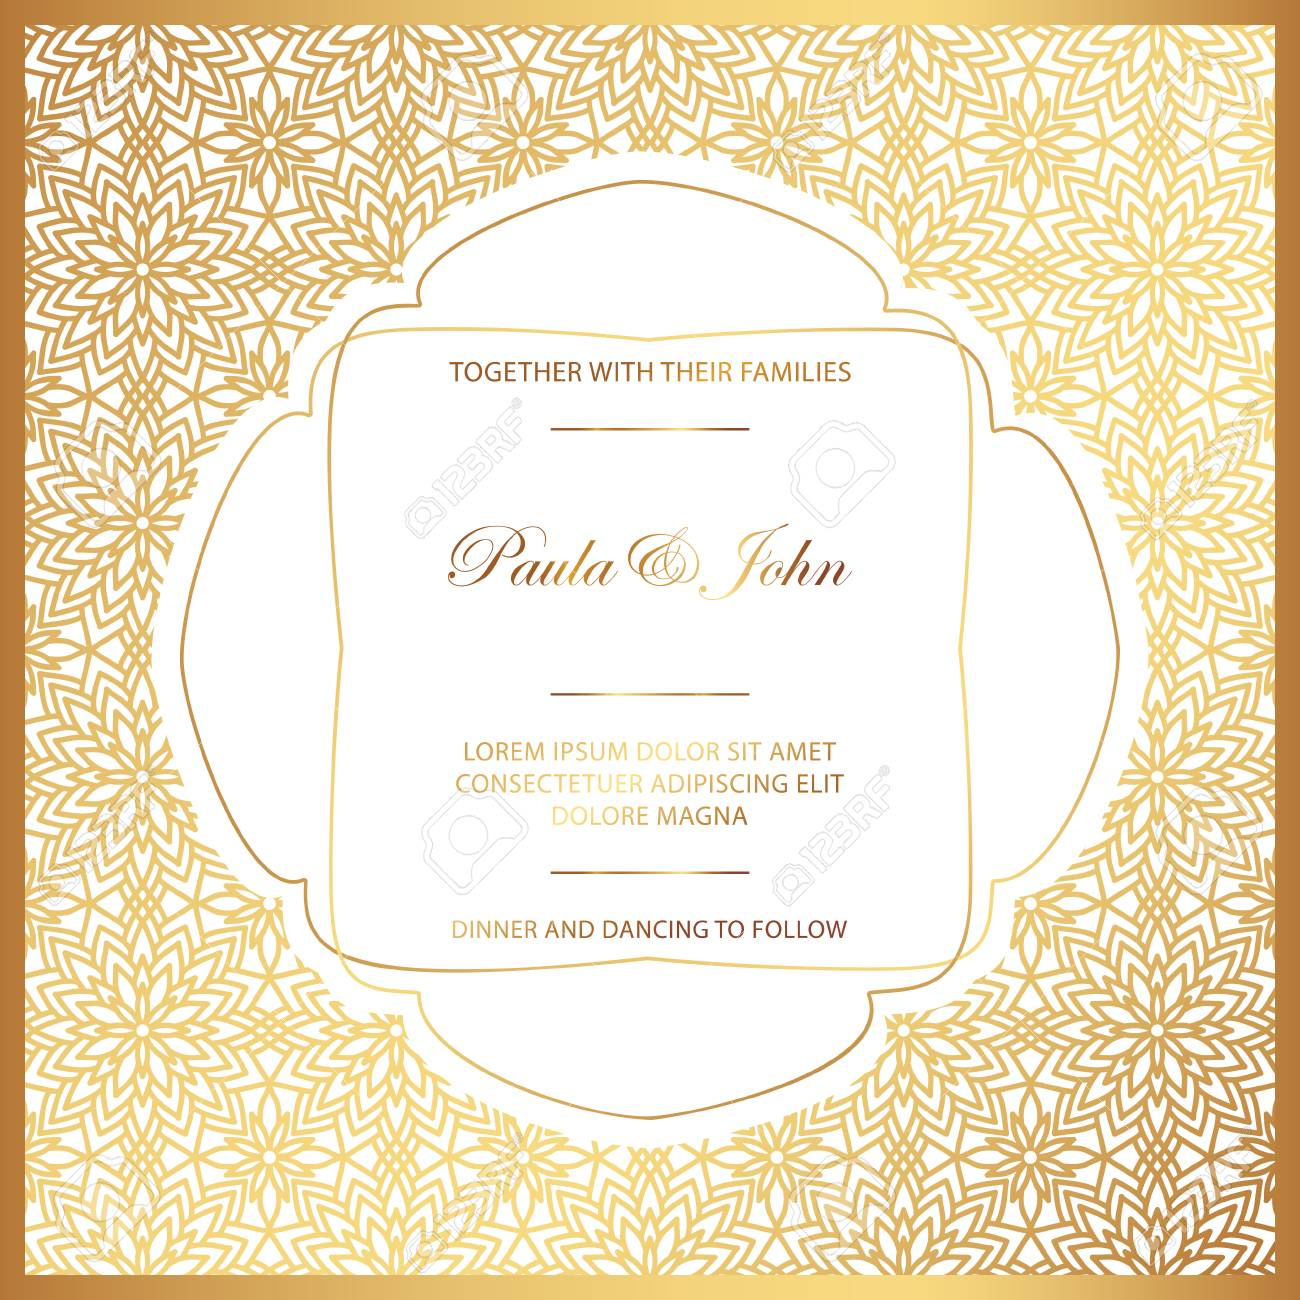 stylish gold and white wedding card royal vintage wedding invitation royalty free cliparts vectors and stock illustration image 98618064